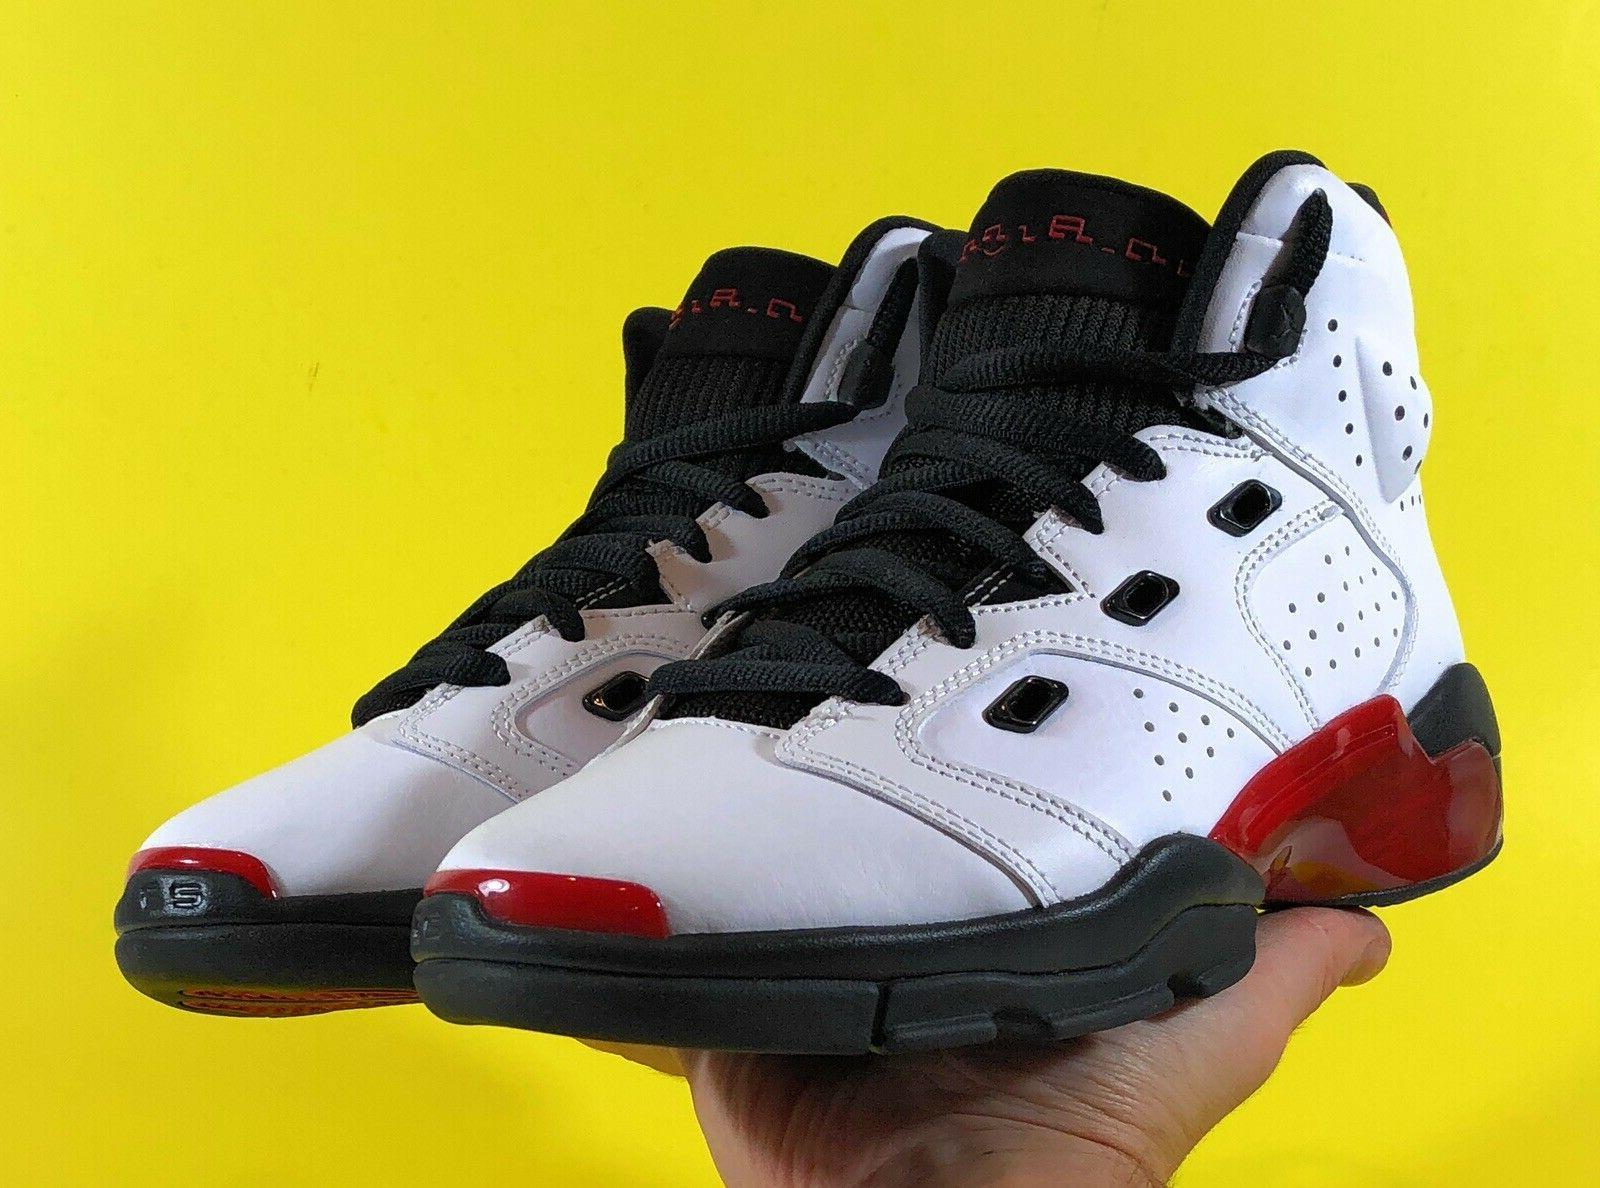 Air 6-17-23 White Gym Red Basketball